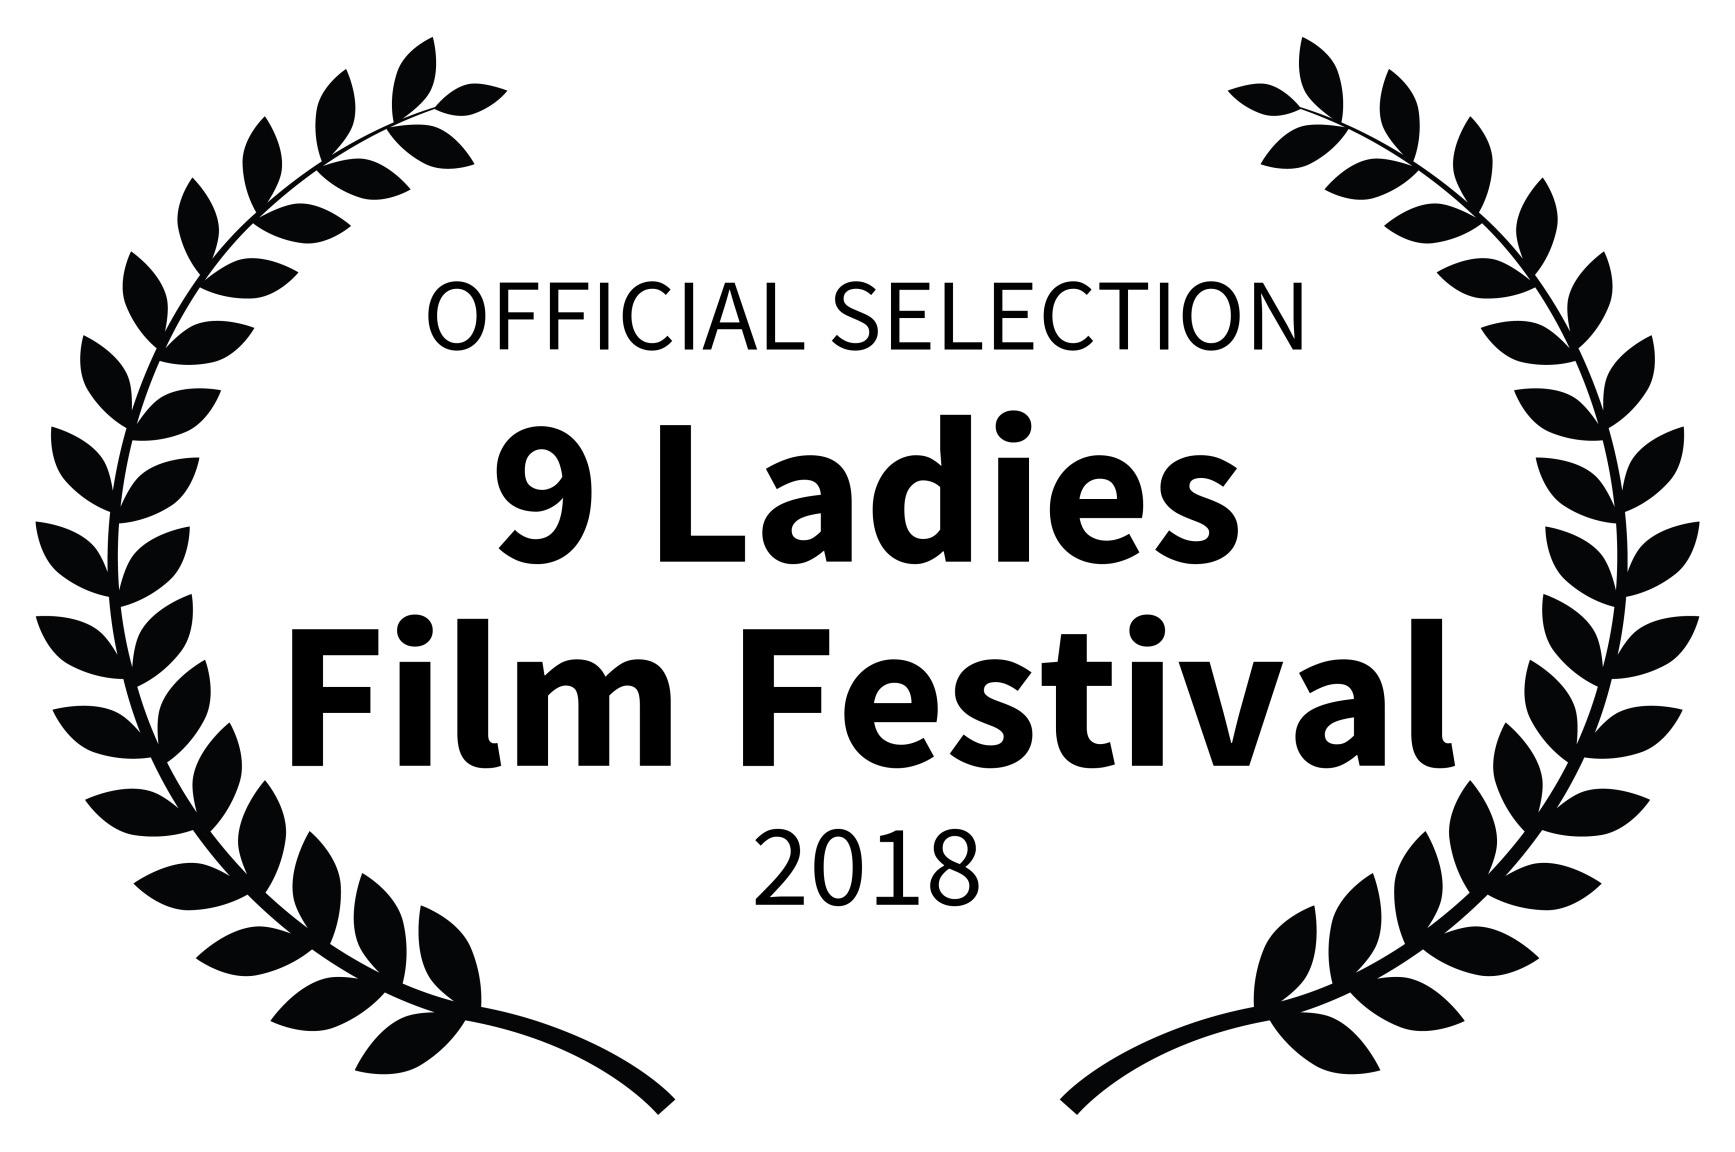 9ladies_film_festival.jpg